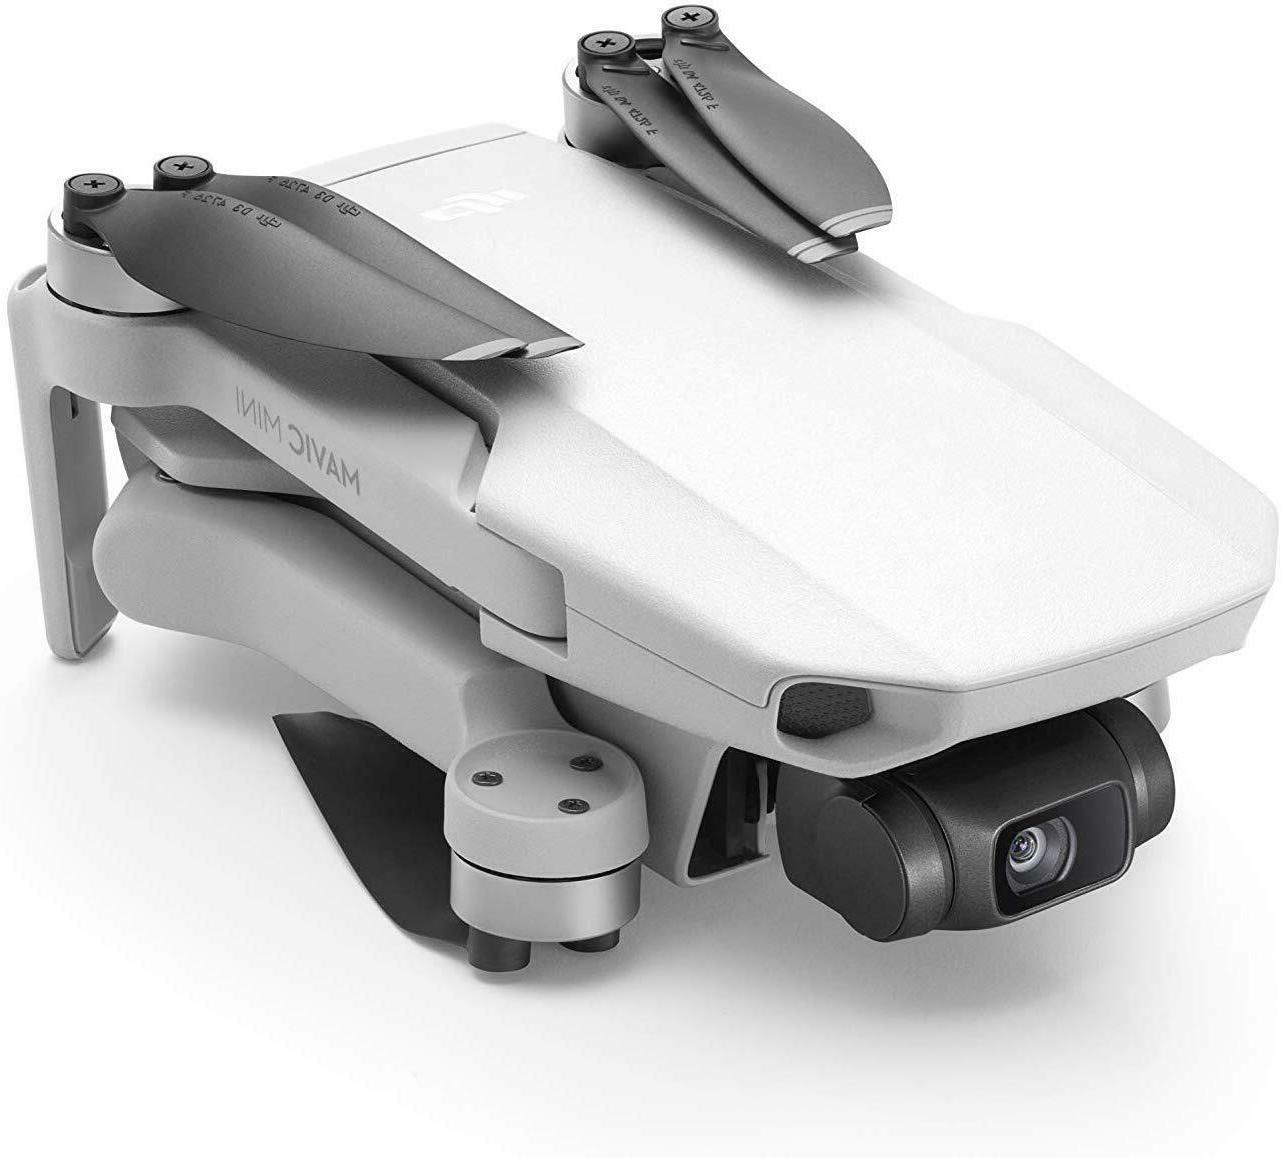 DJI Mavic More combo - Drone with Combo